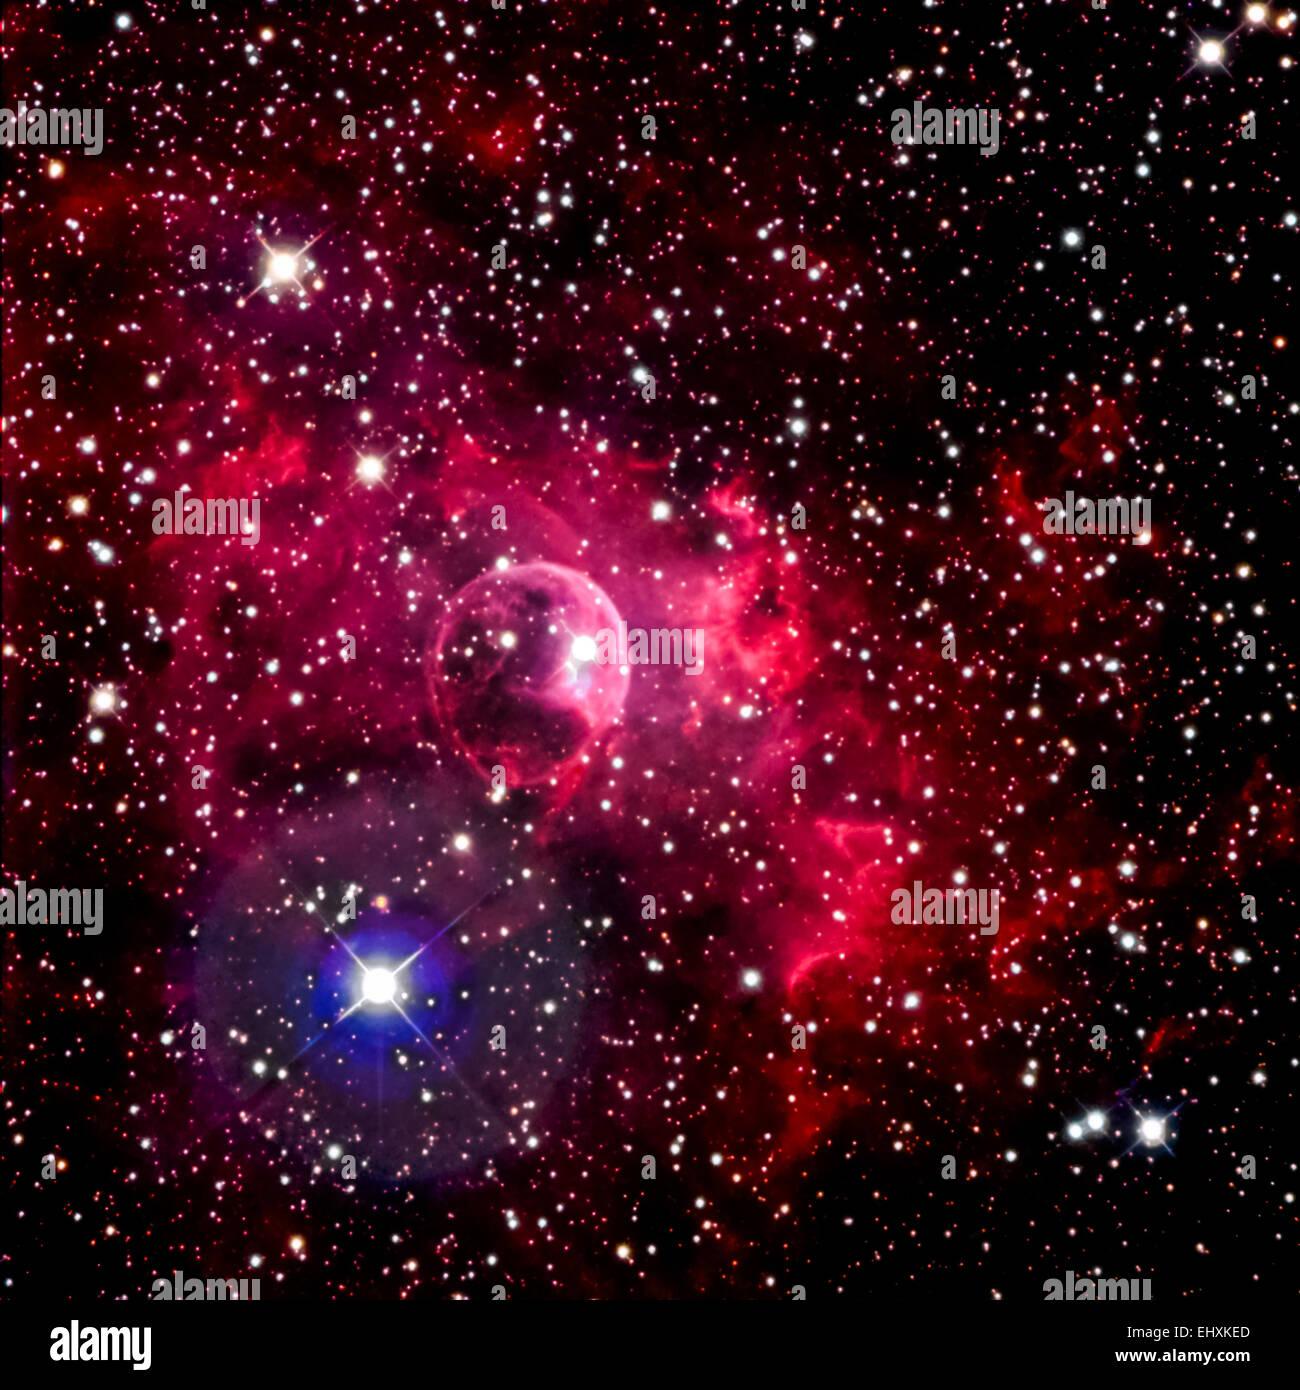 NGC 7635, the Bubble Nebula (Actual Astrophotograph) - Stock Image